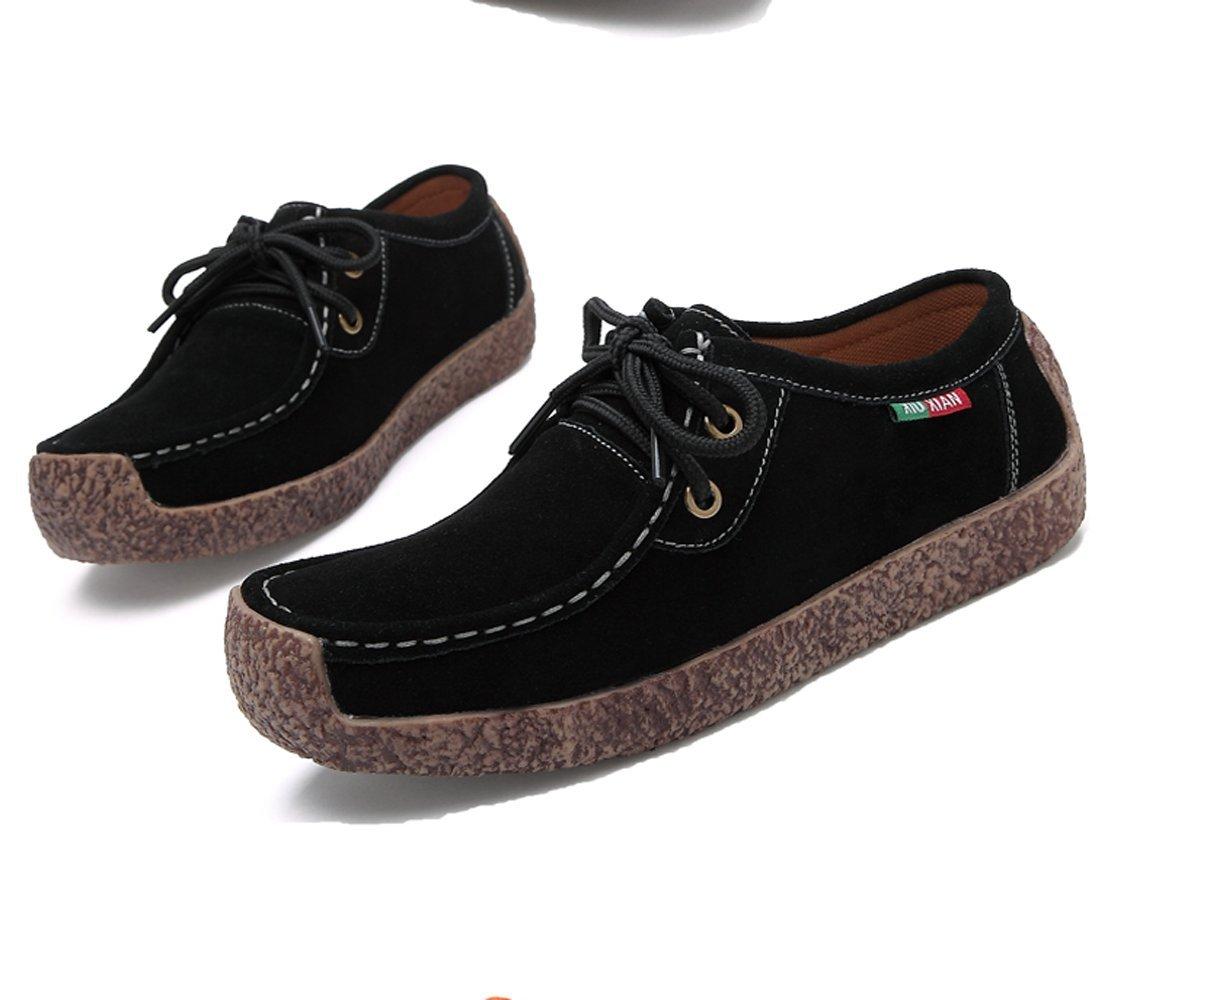 XIUXIAN Women Snail Casual Lace-up Genuine Leather Flat Sneaker Shoes(8.5 B(M) US,Coffee)